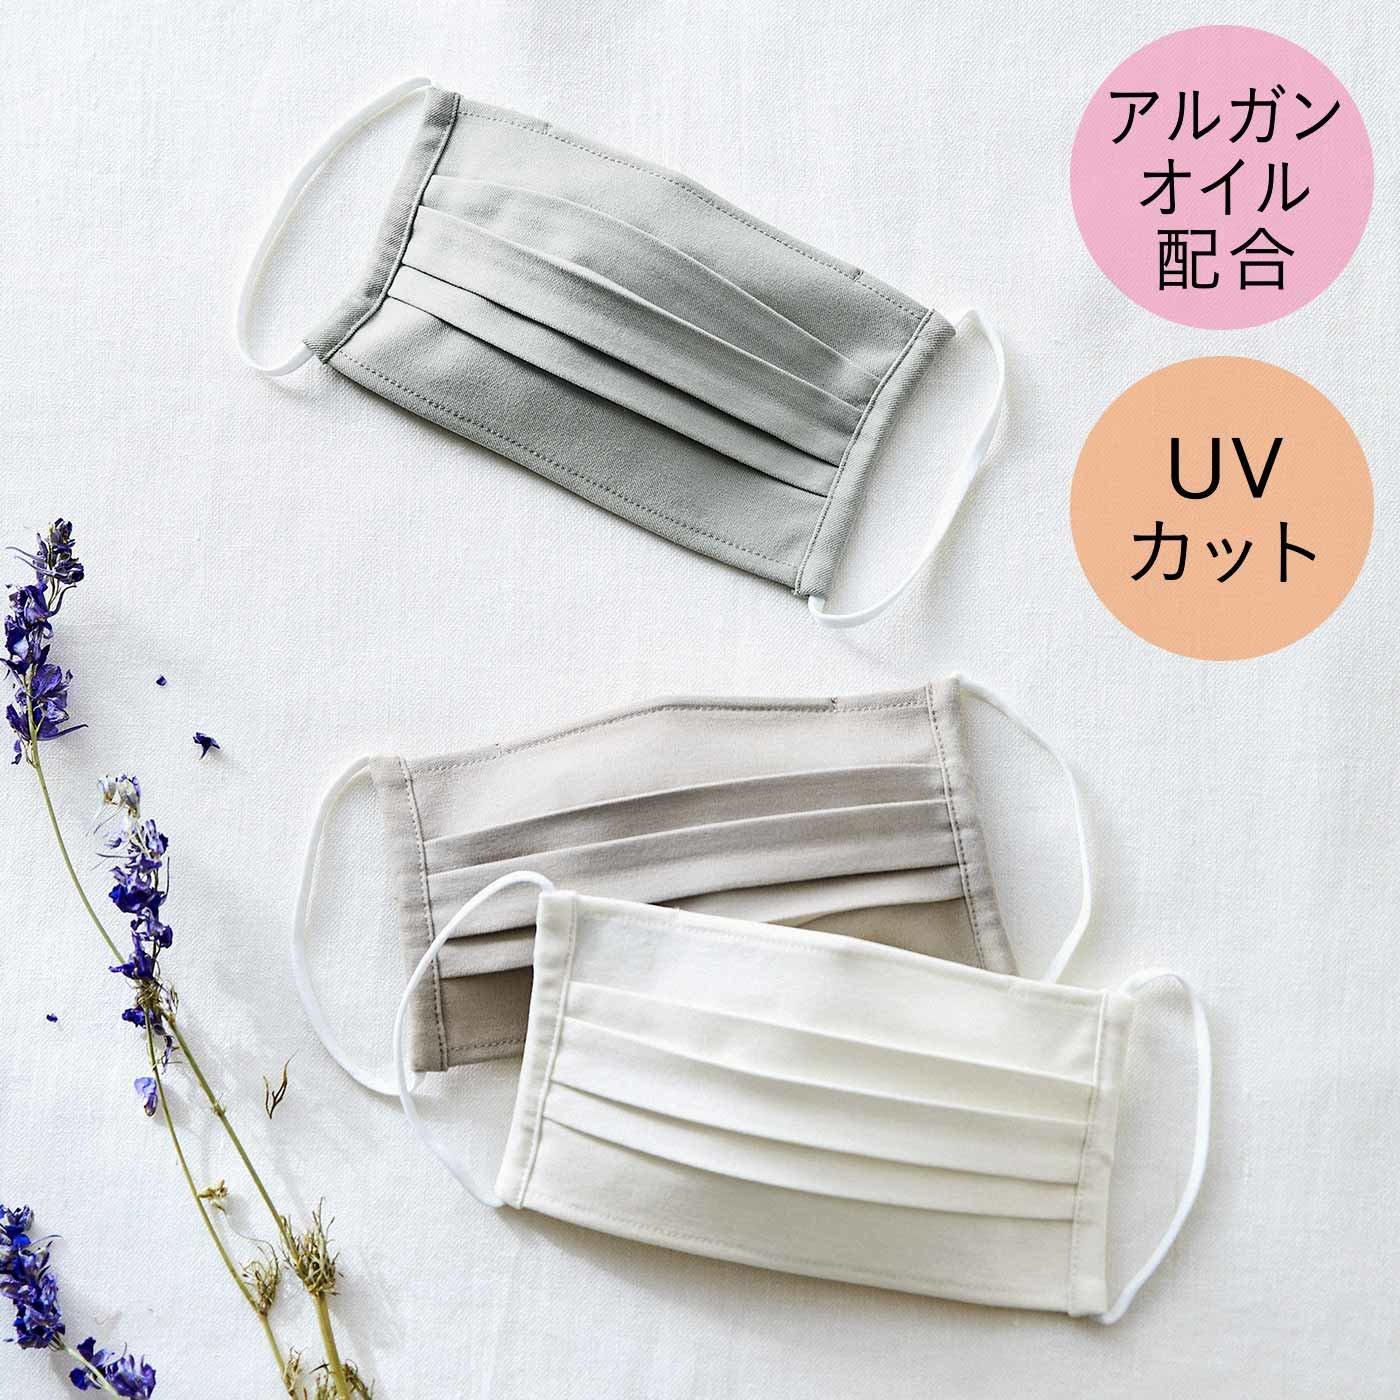 IEDIT[イディット] UVケア アルガンオイル配合でなめらかな肌ざわりがうれしい プリーツ布マスク